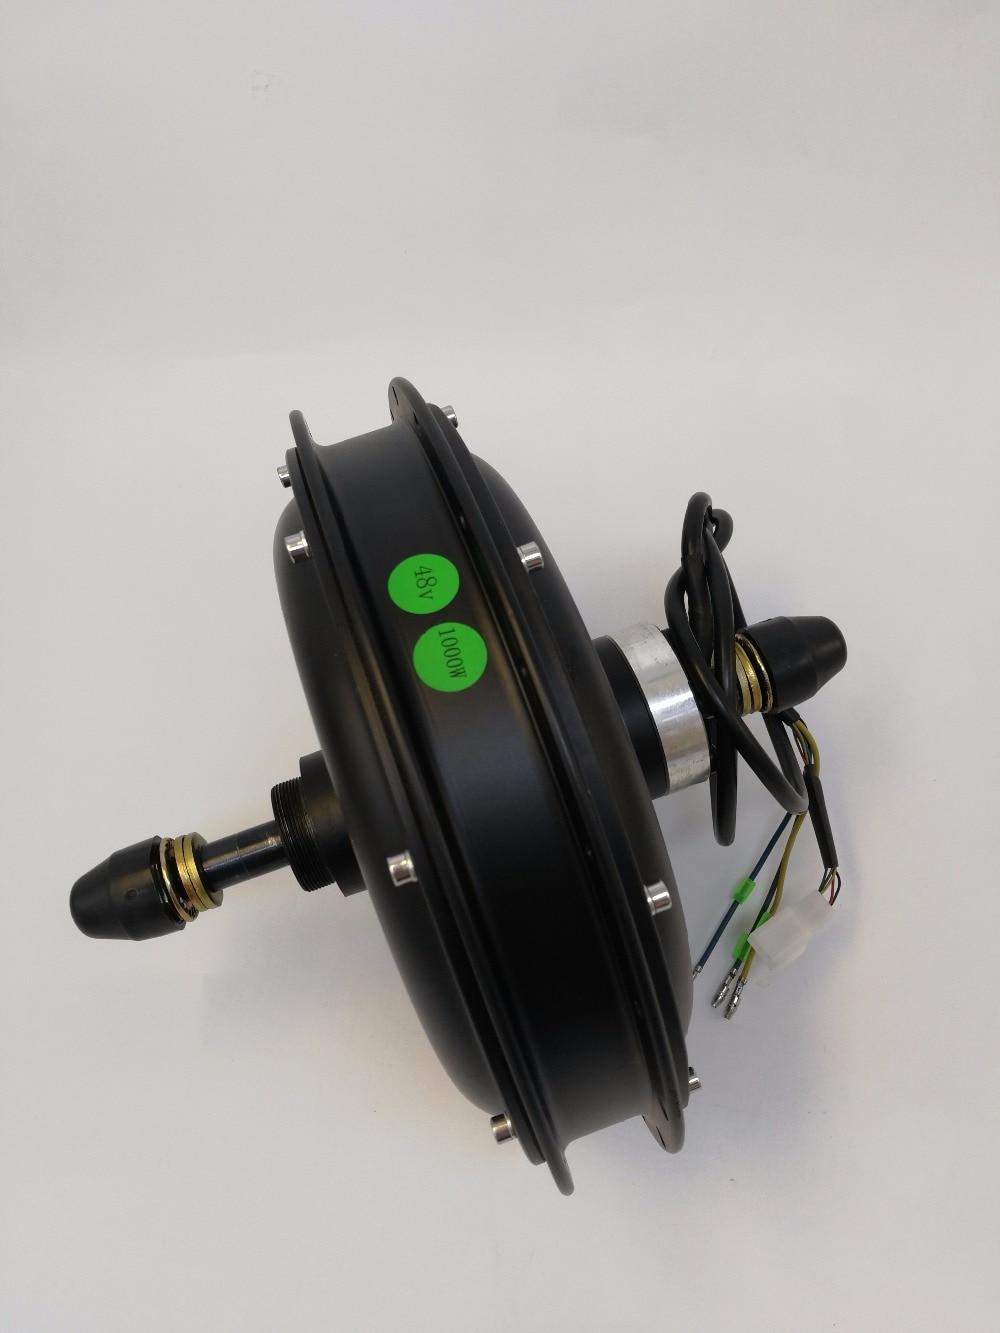 EVFITTING E bike Fatbike Motor 48Volt 1000W Brushless DC Hub Motor for Rear Wheel Fatbike 170mm